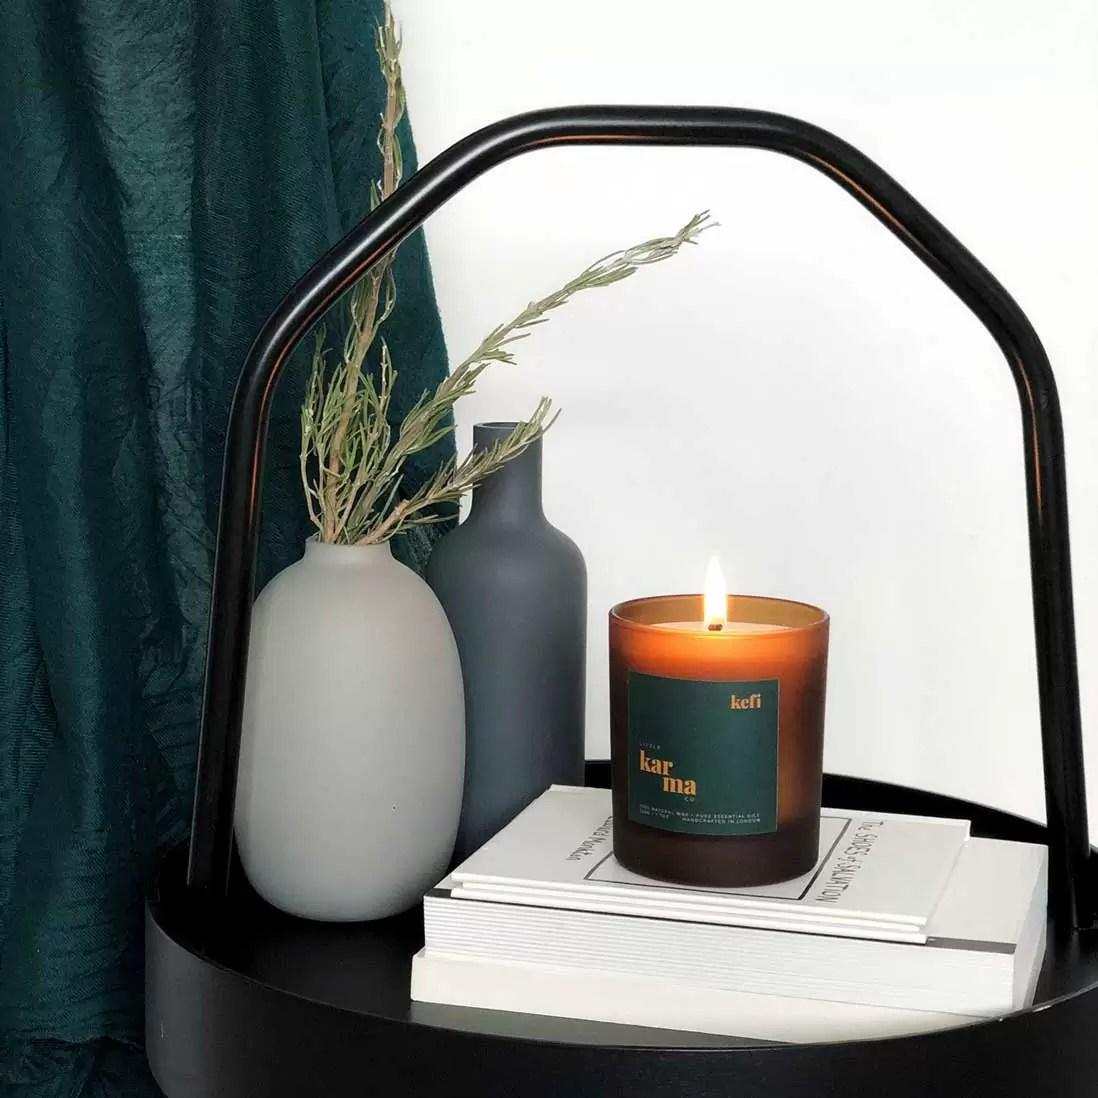 kefi | invigorating rosemary + spearmint refillable large candle [220g]